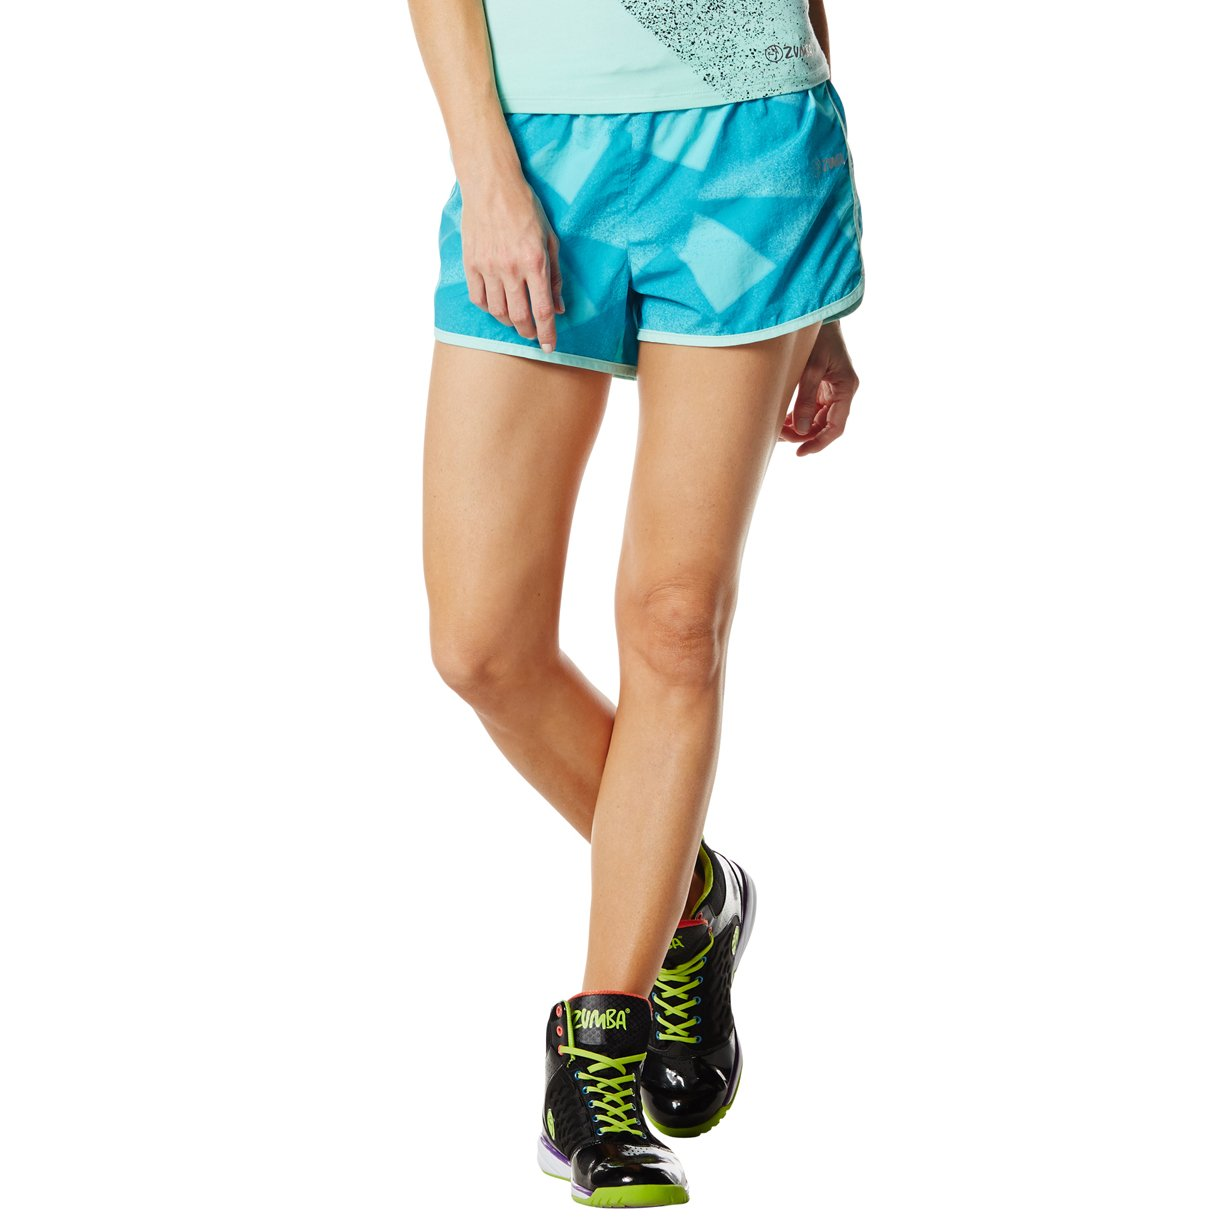 Zumba Fitness, Pantaloncini Print Donna, Blu (Deep Blue Sea), XL Z1B00196 : Z1B00196-XL-DEBS